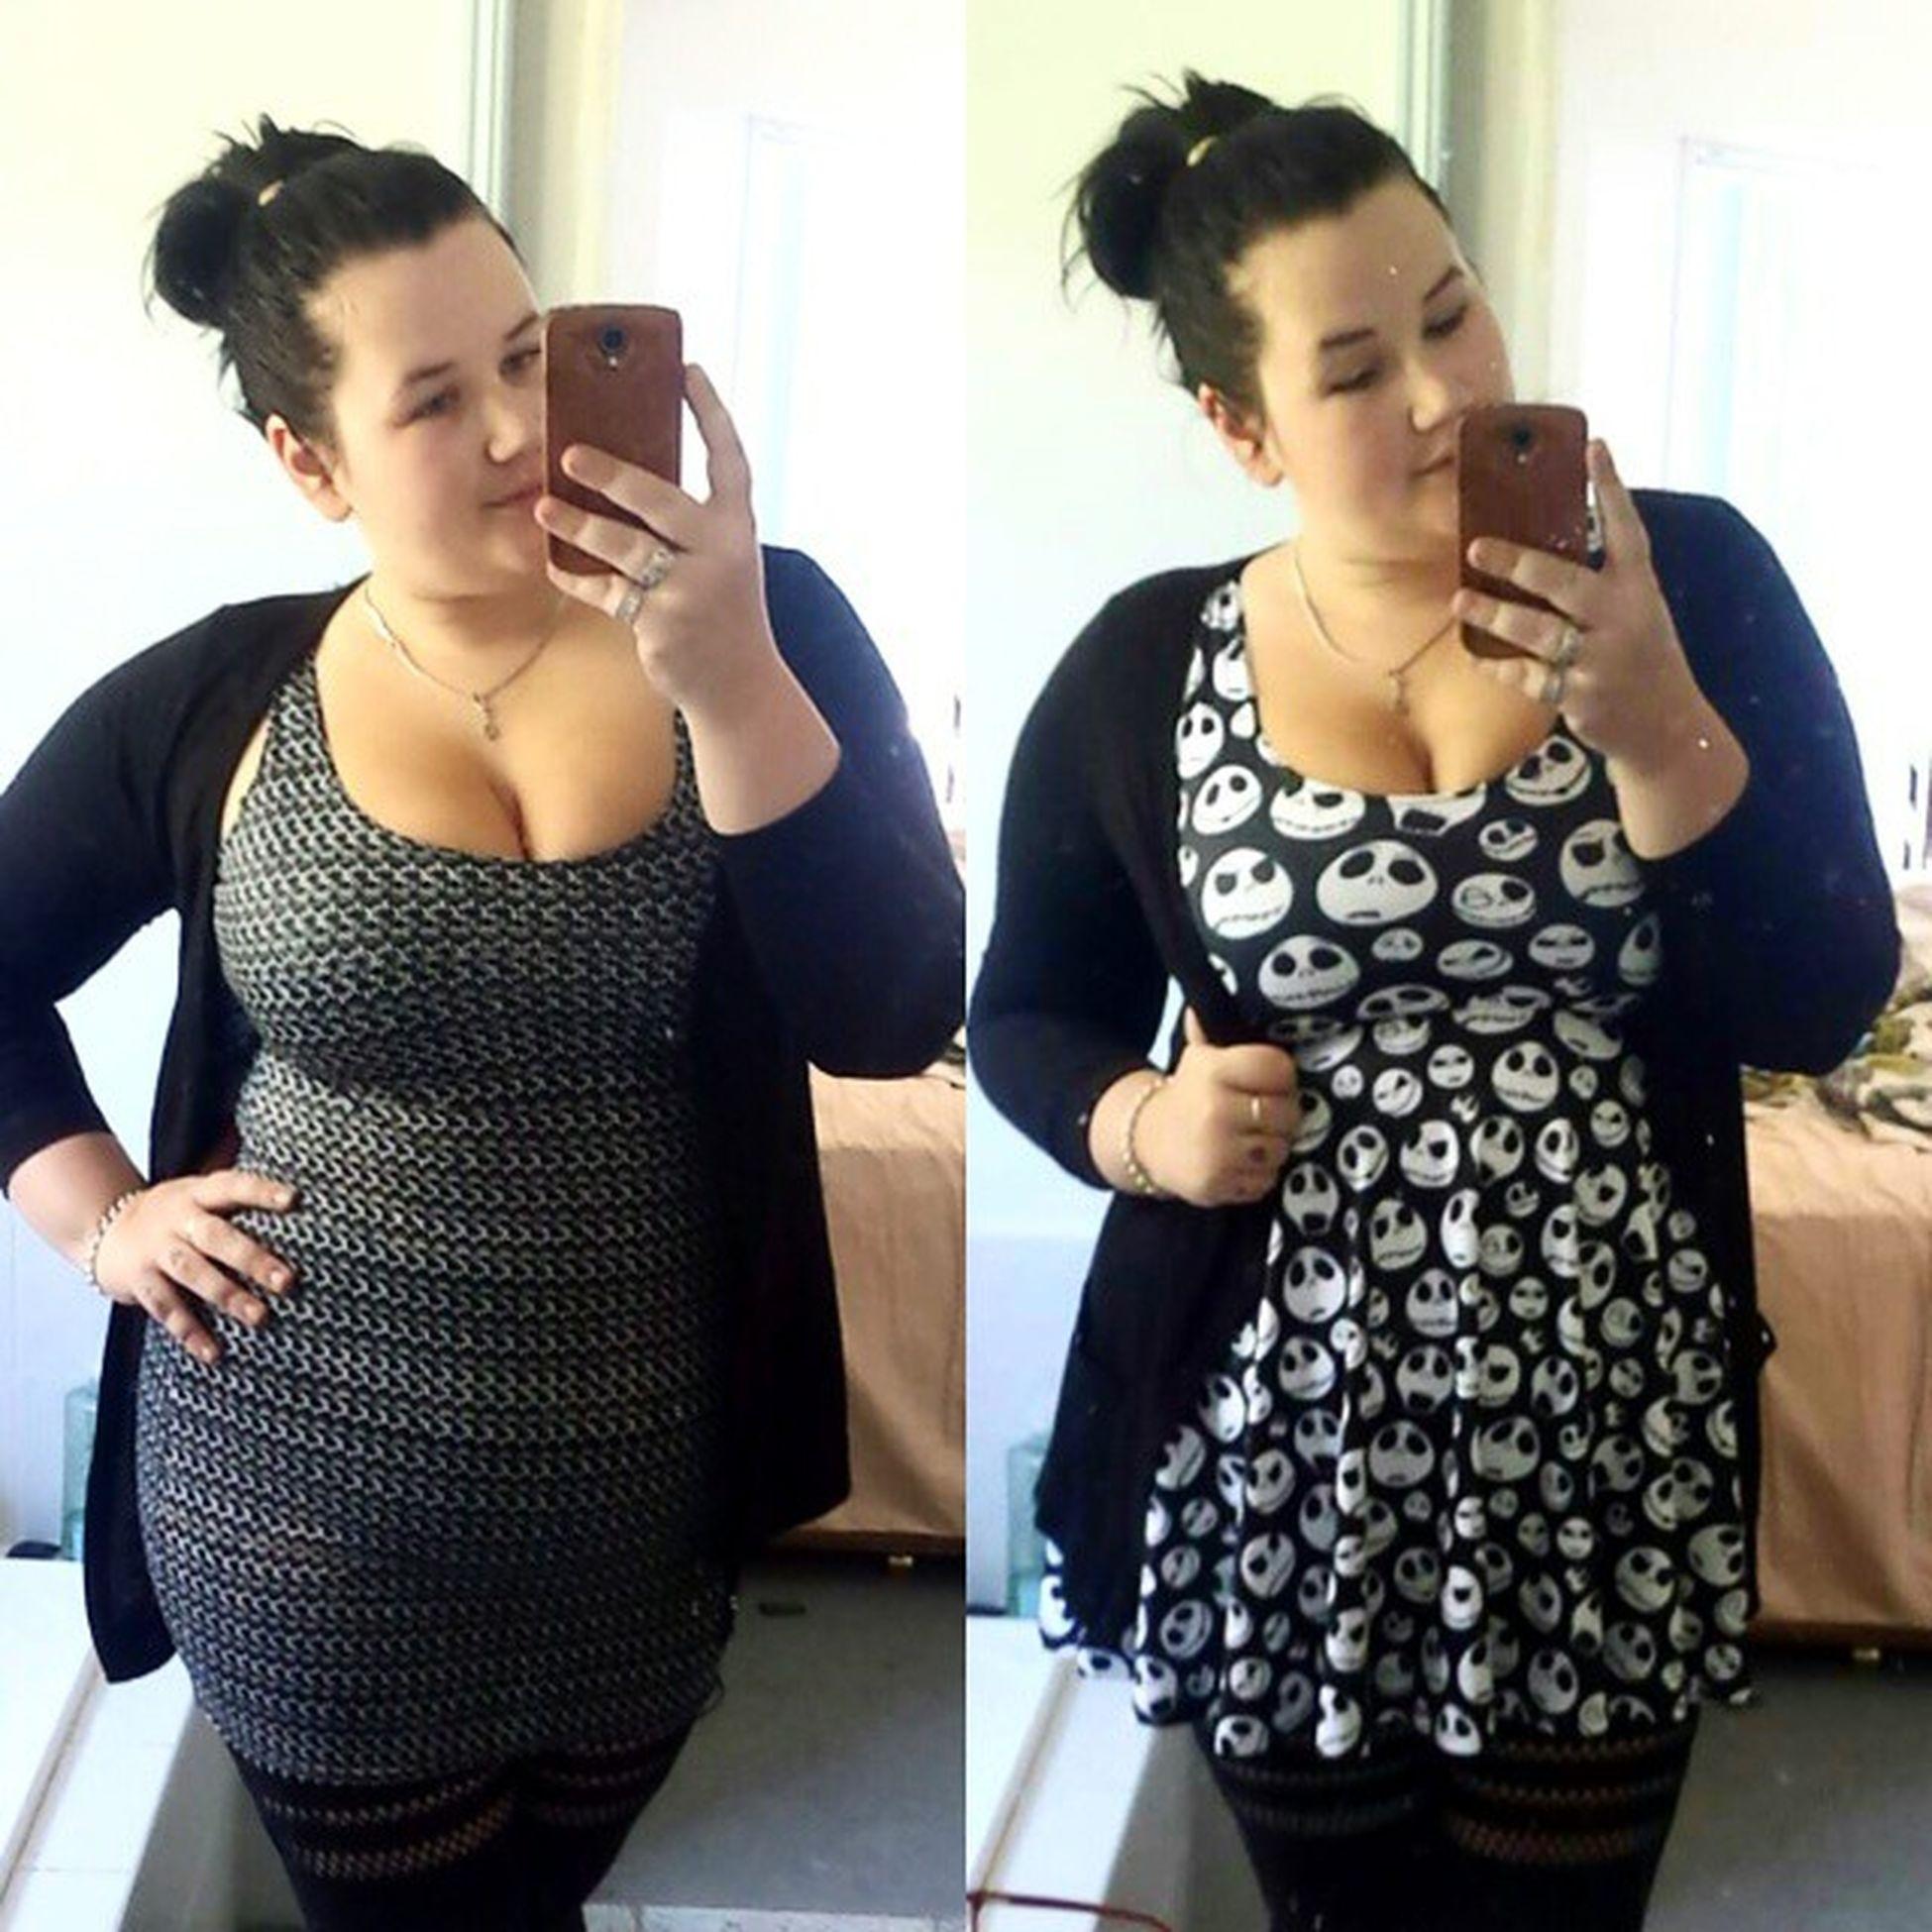 Little bit indecisive today with my outfit. Blackmilkclothing Bmjackskellingtonscoopskaterdress Bmchainmaildress Bmsportystripeshosiery2 BMLL bmcurves doublebm effyourbeautystandards